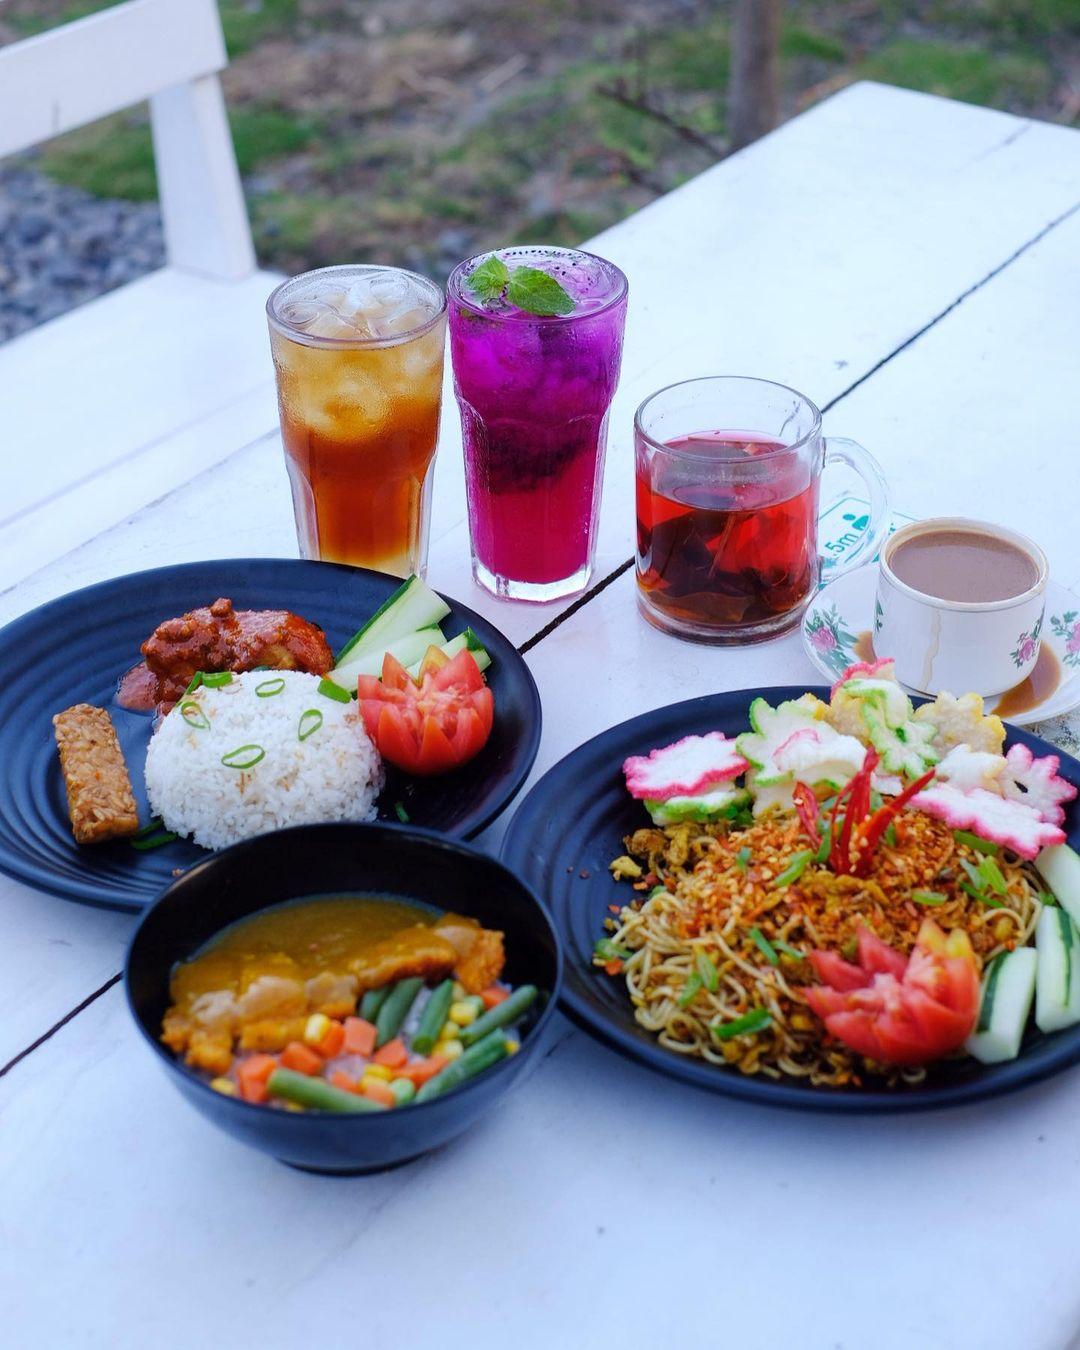 Makanan Di Nilu Kopi Jogja Image From @jogjafoodhunter